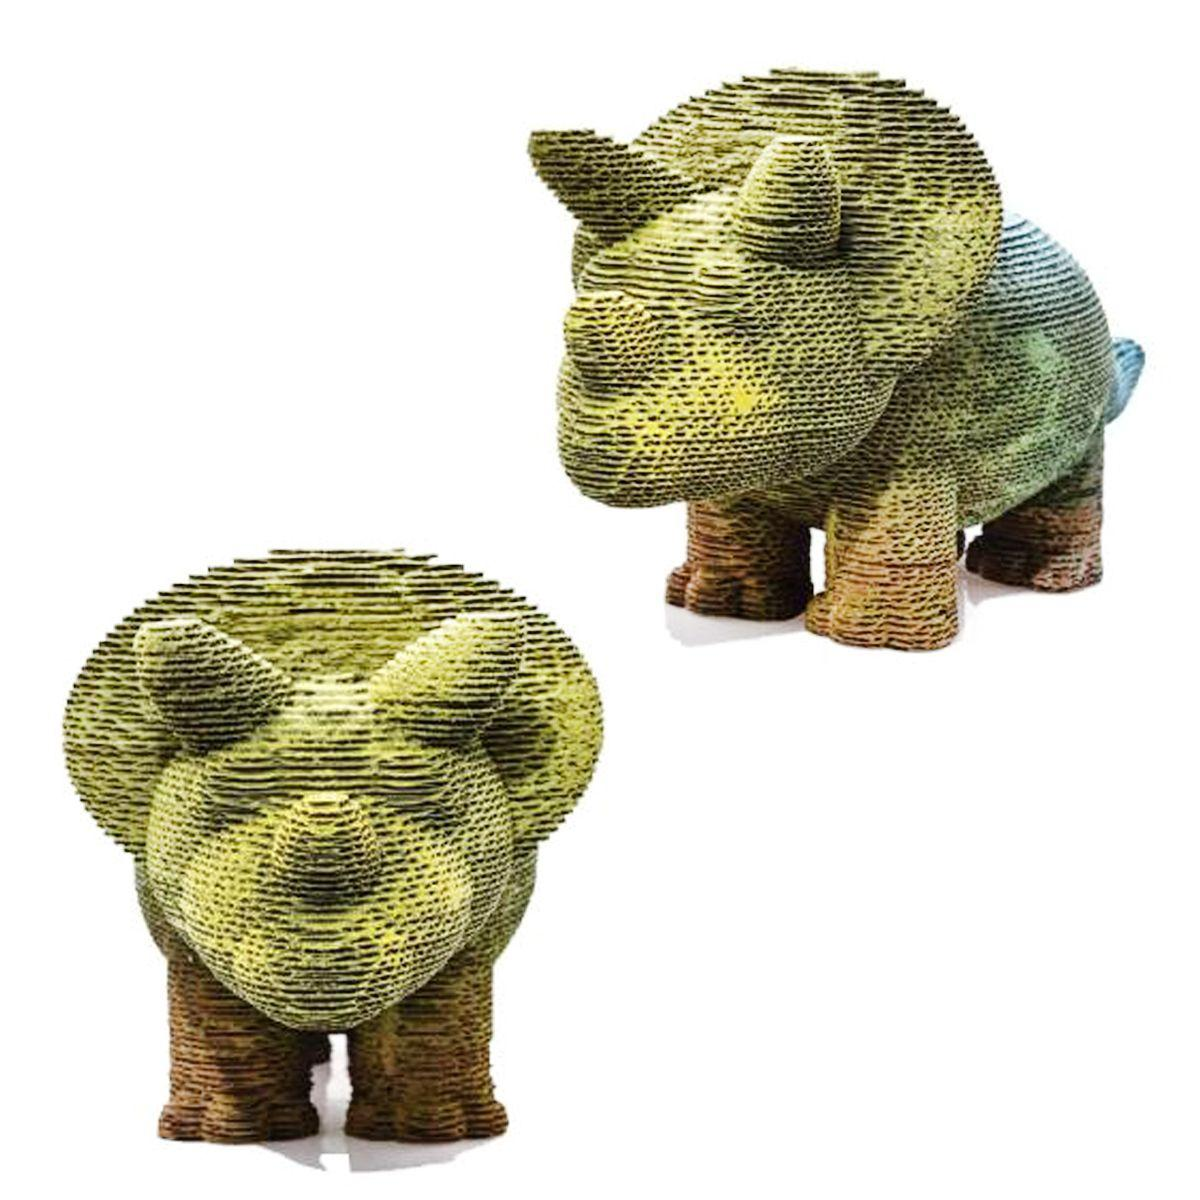 3D Пазл Трицератопс SKL88-309010